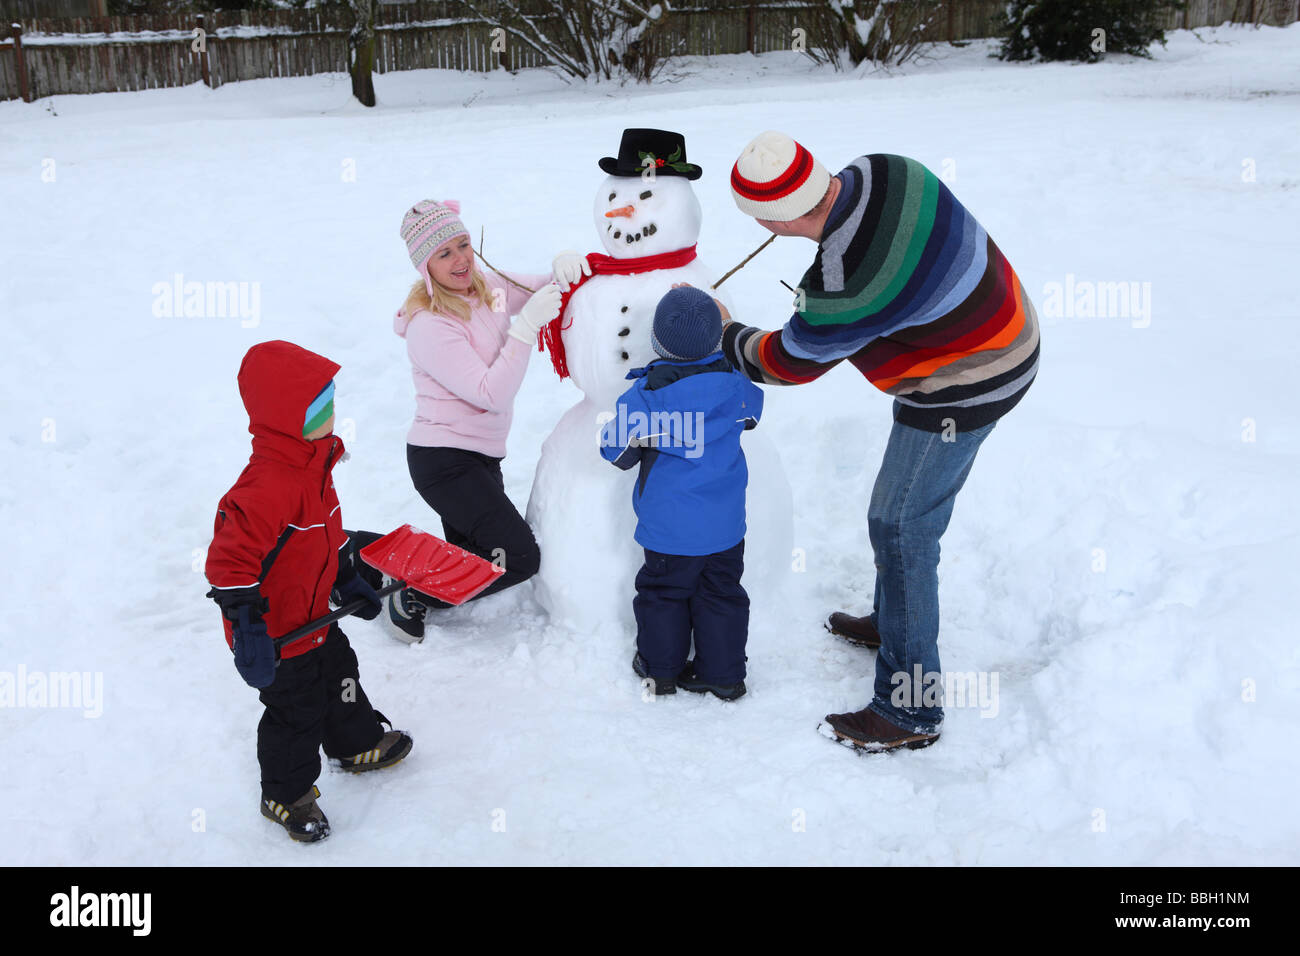 Family Making A Snowman Stock Photo